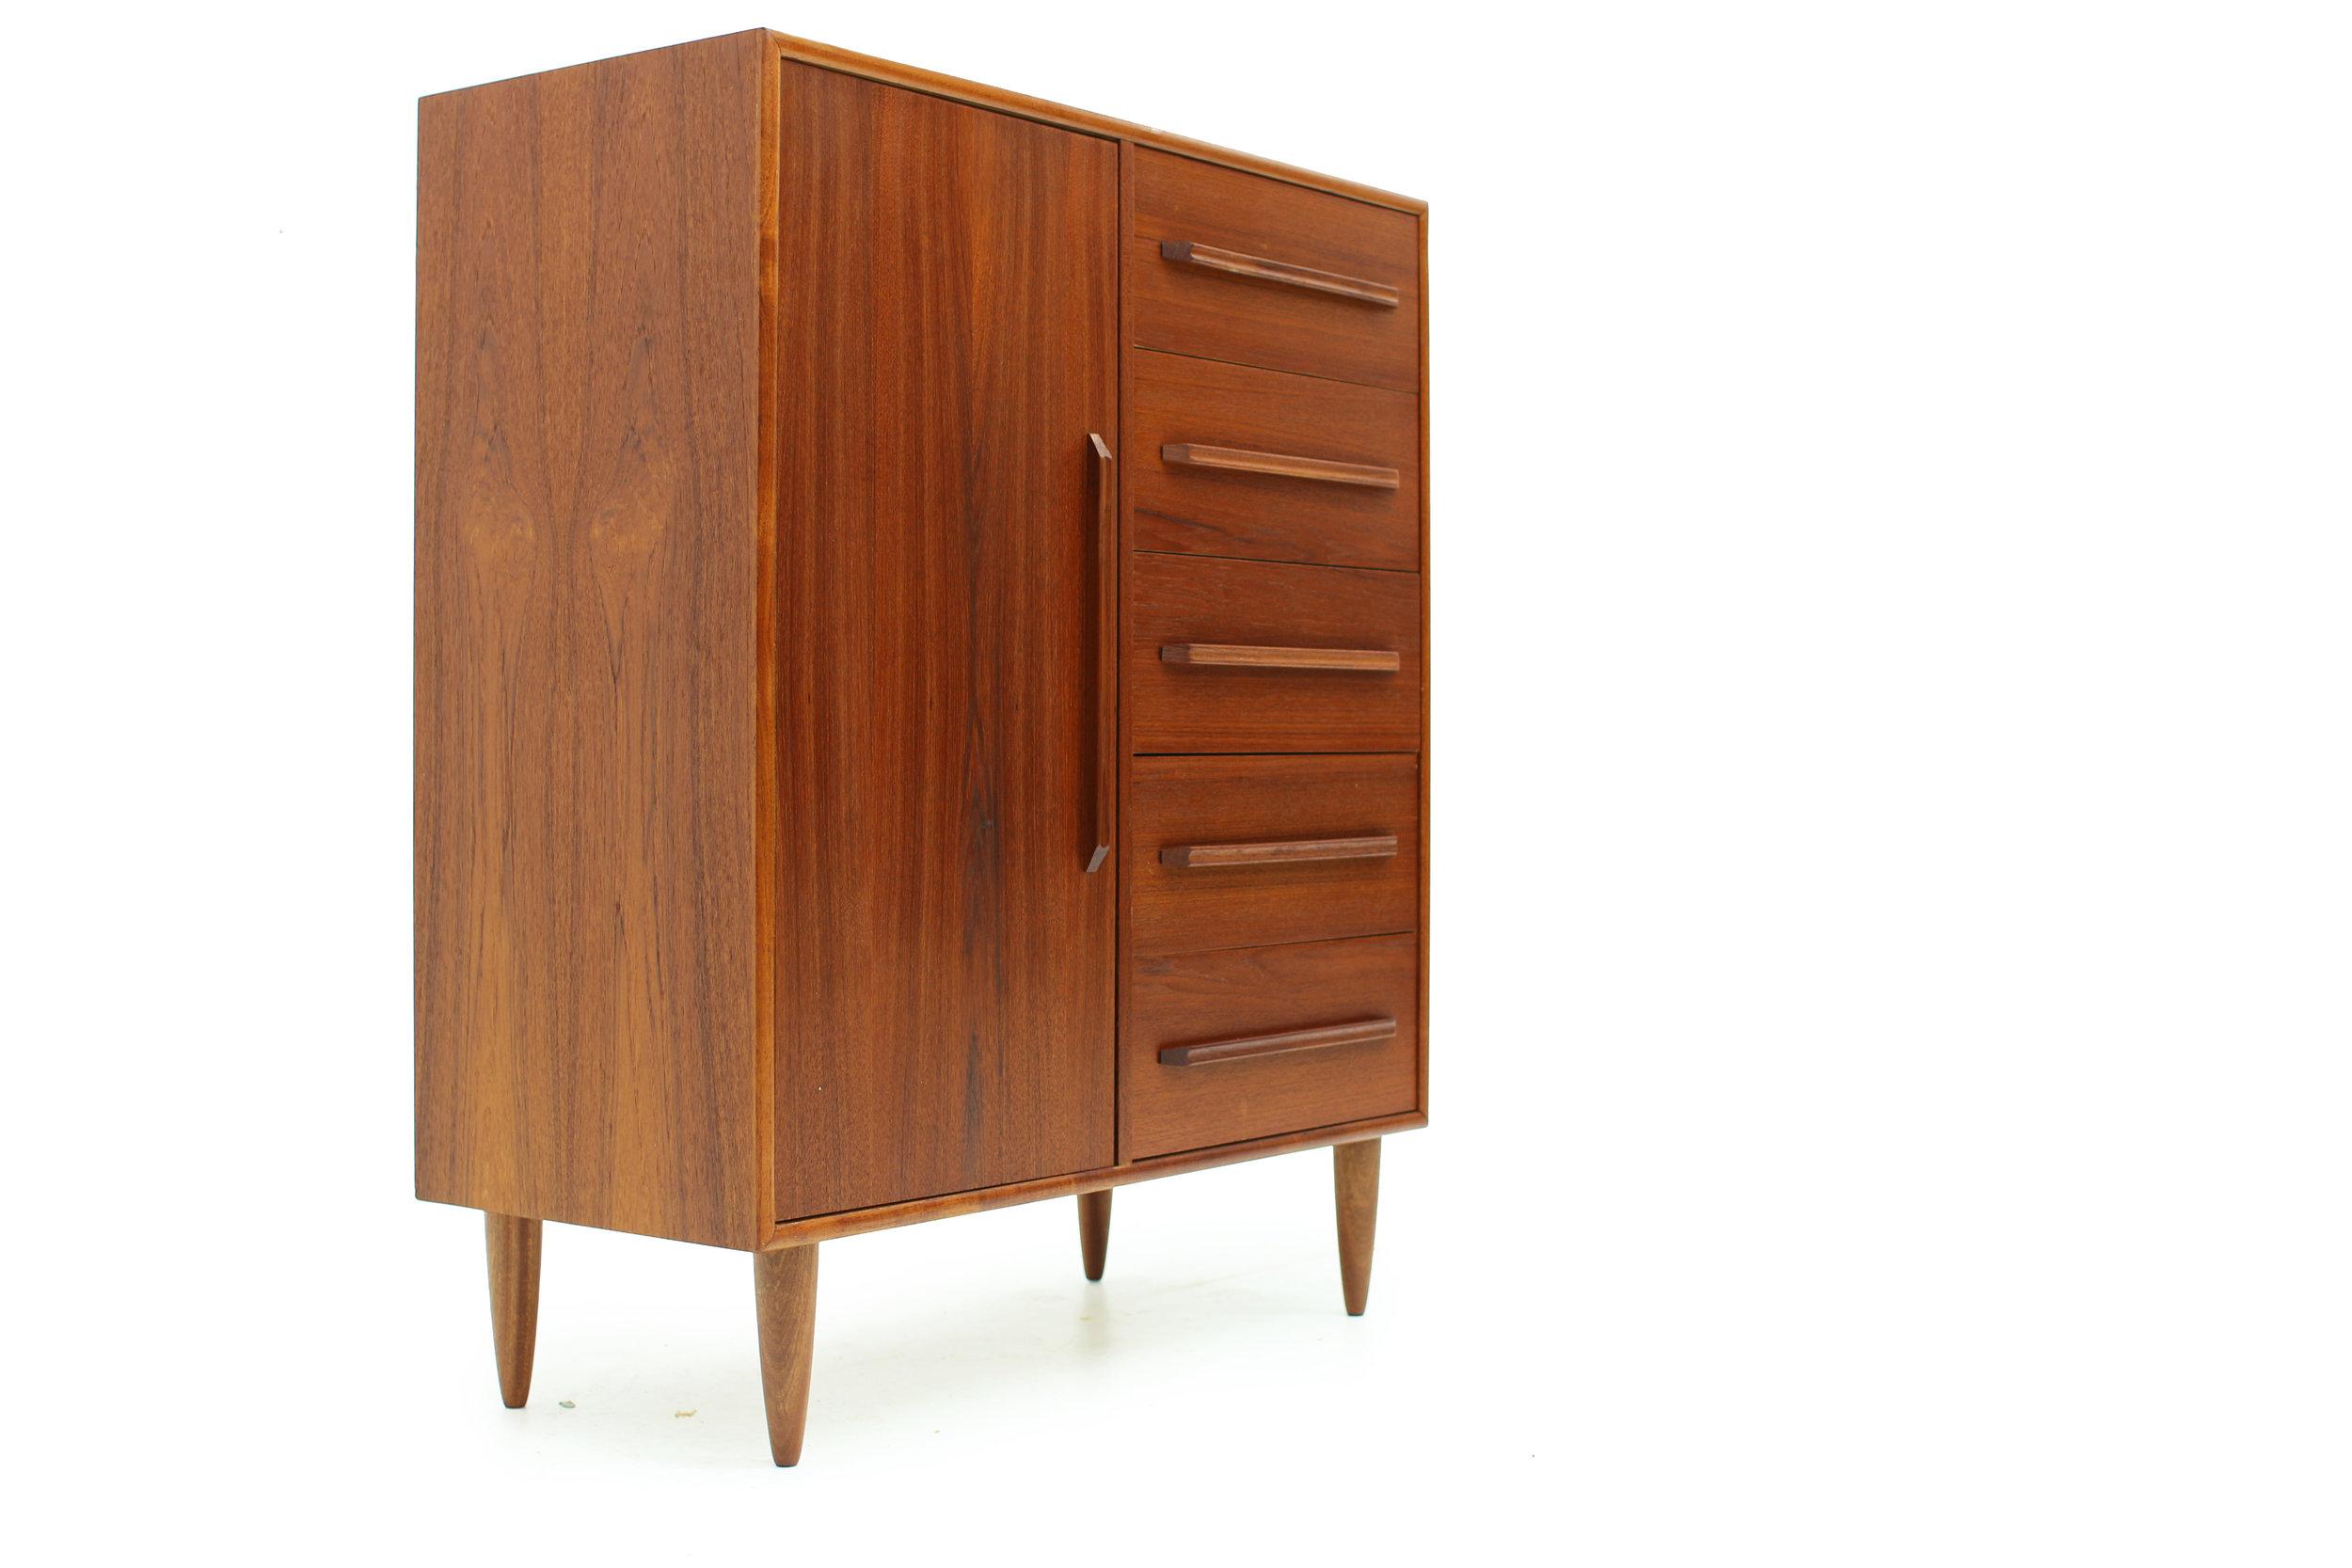 MCM Teakwood Gentleman's Chest Dresser (4).jpg